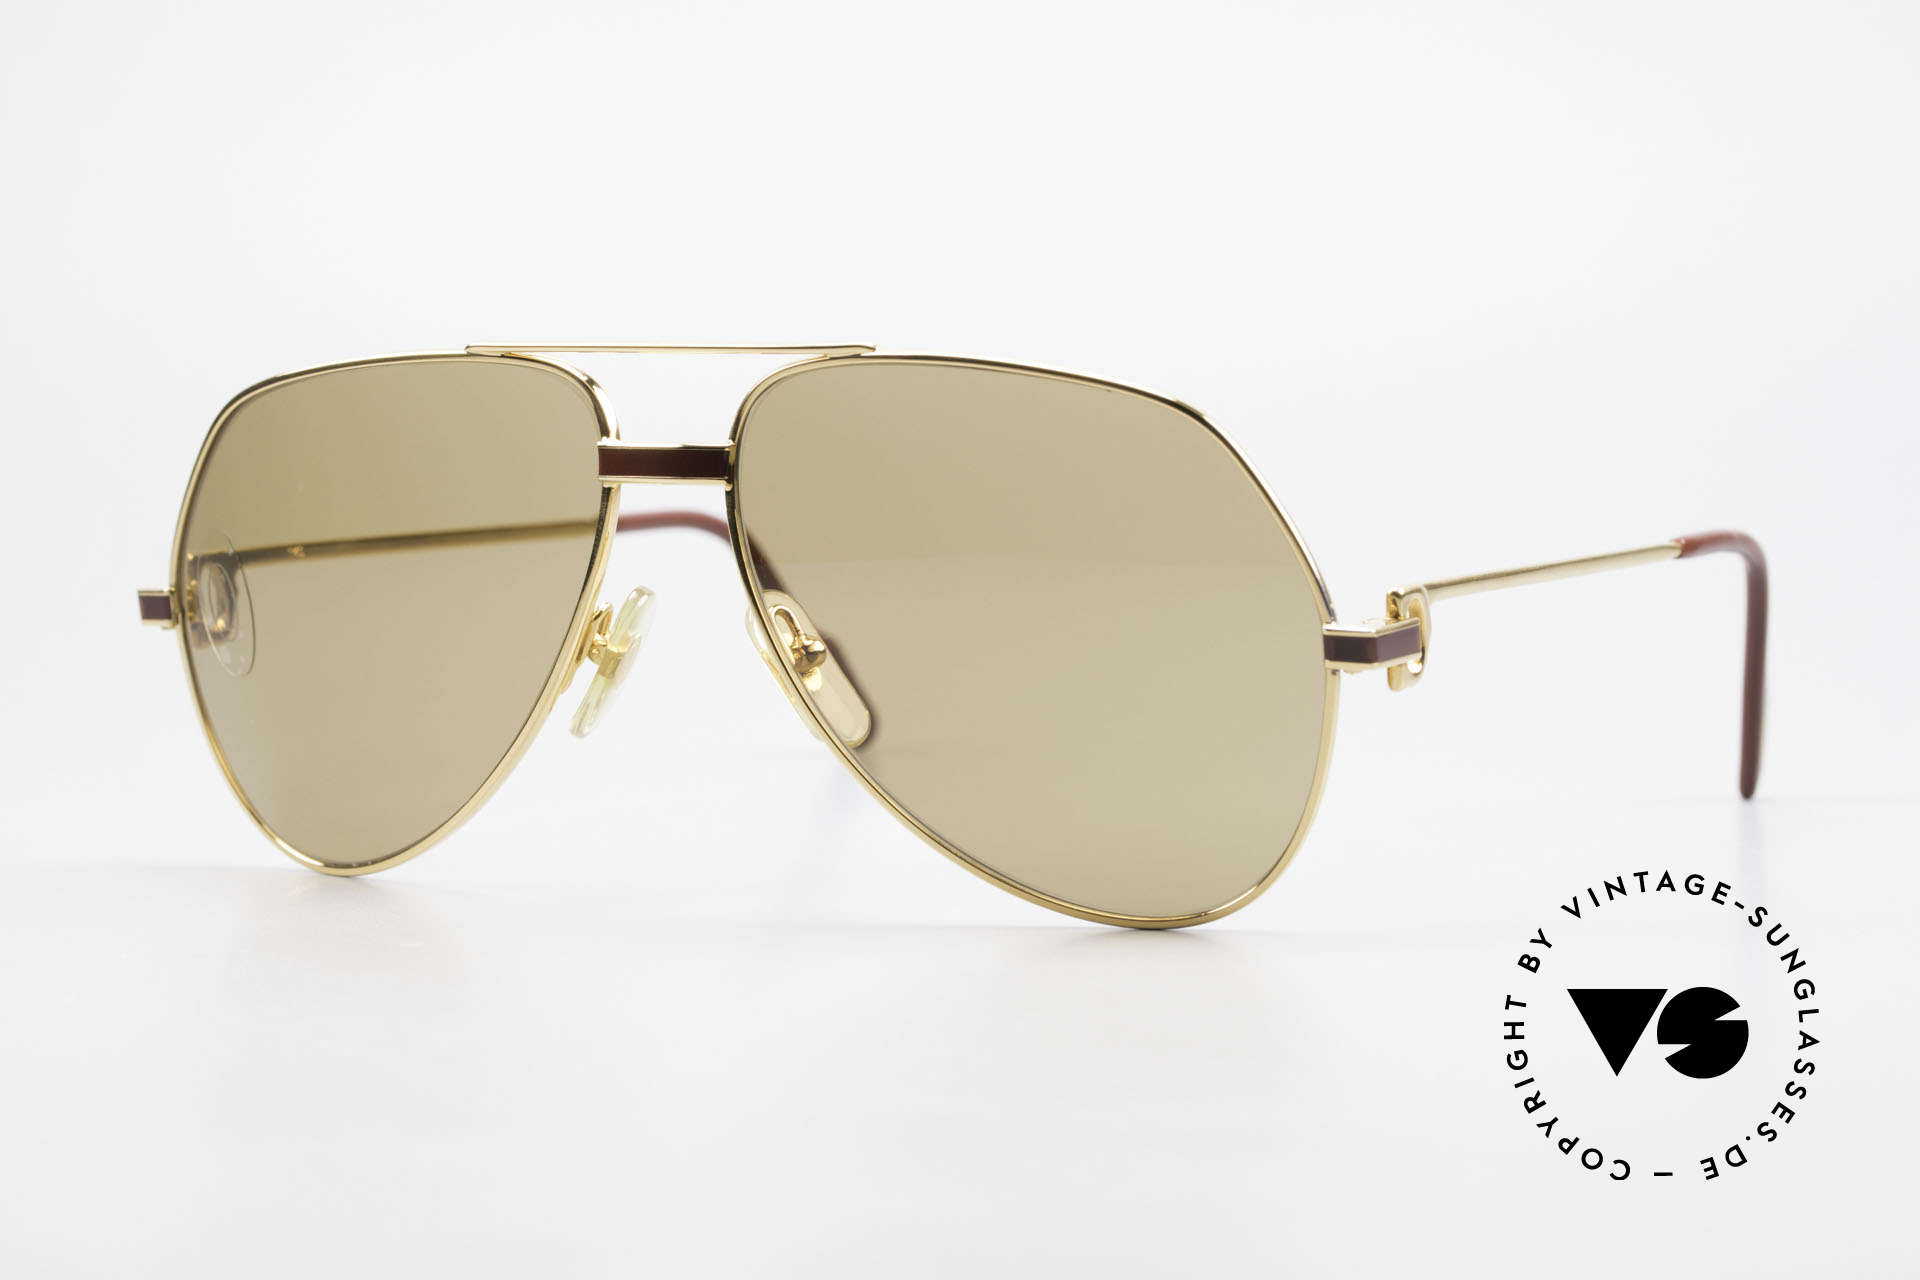 Cartier Vendome Laque - M Mystic Cartier Mineral Lenses, Vendome = the most famous eyewear design by CARTIER, Made for Men